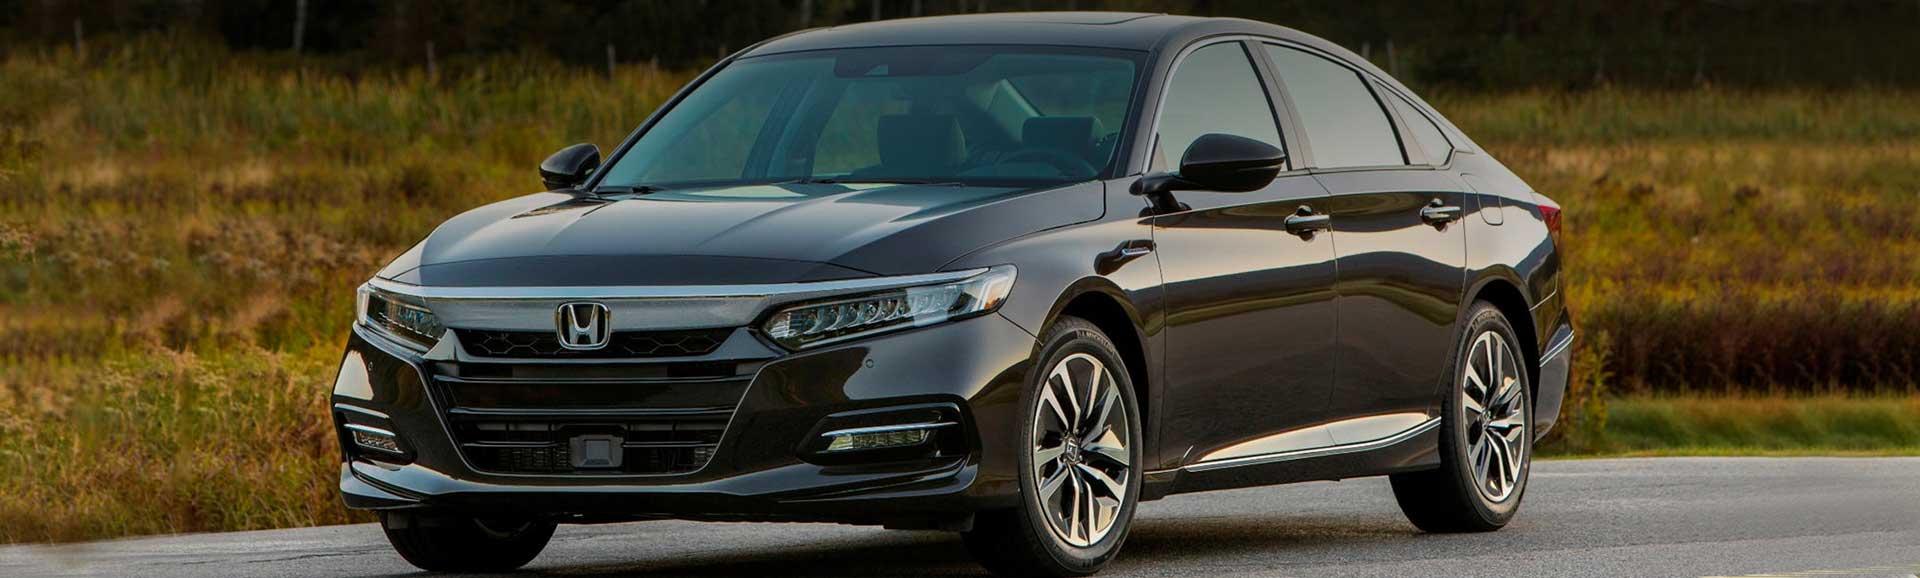 Ford Dealership Modesto >> Greenlight Auto Sales Car Dealer In Modesto Ca